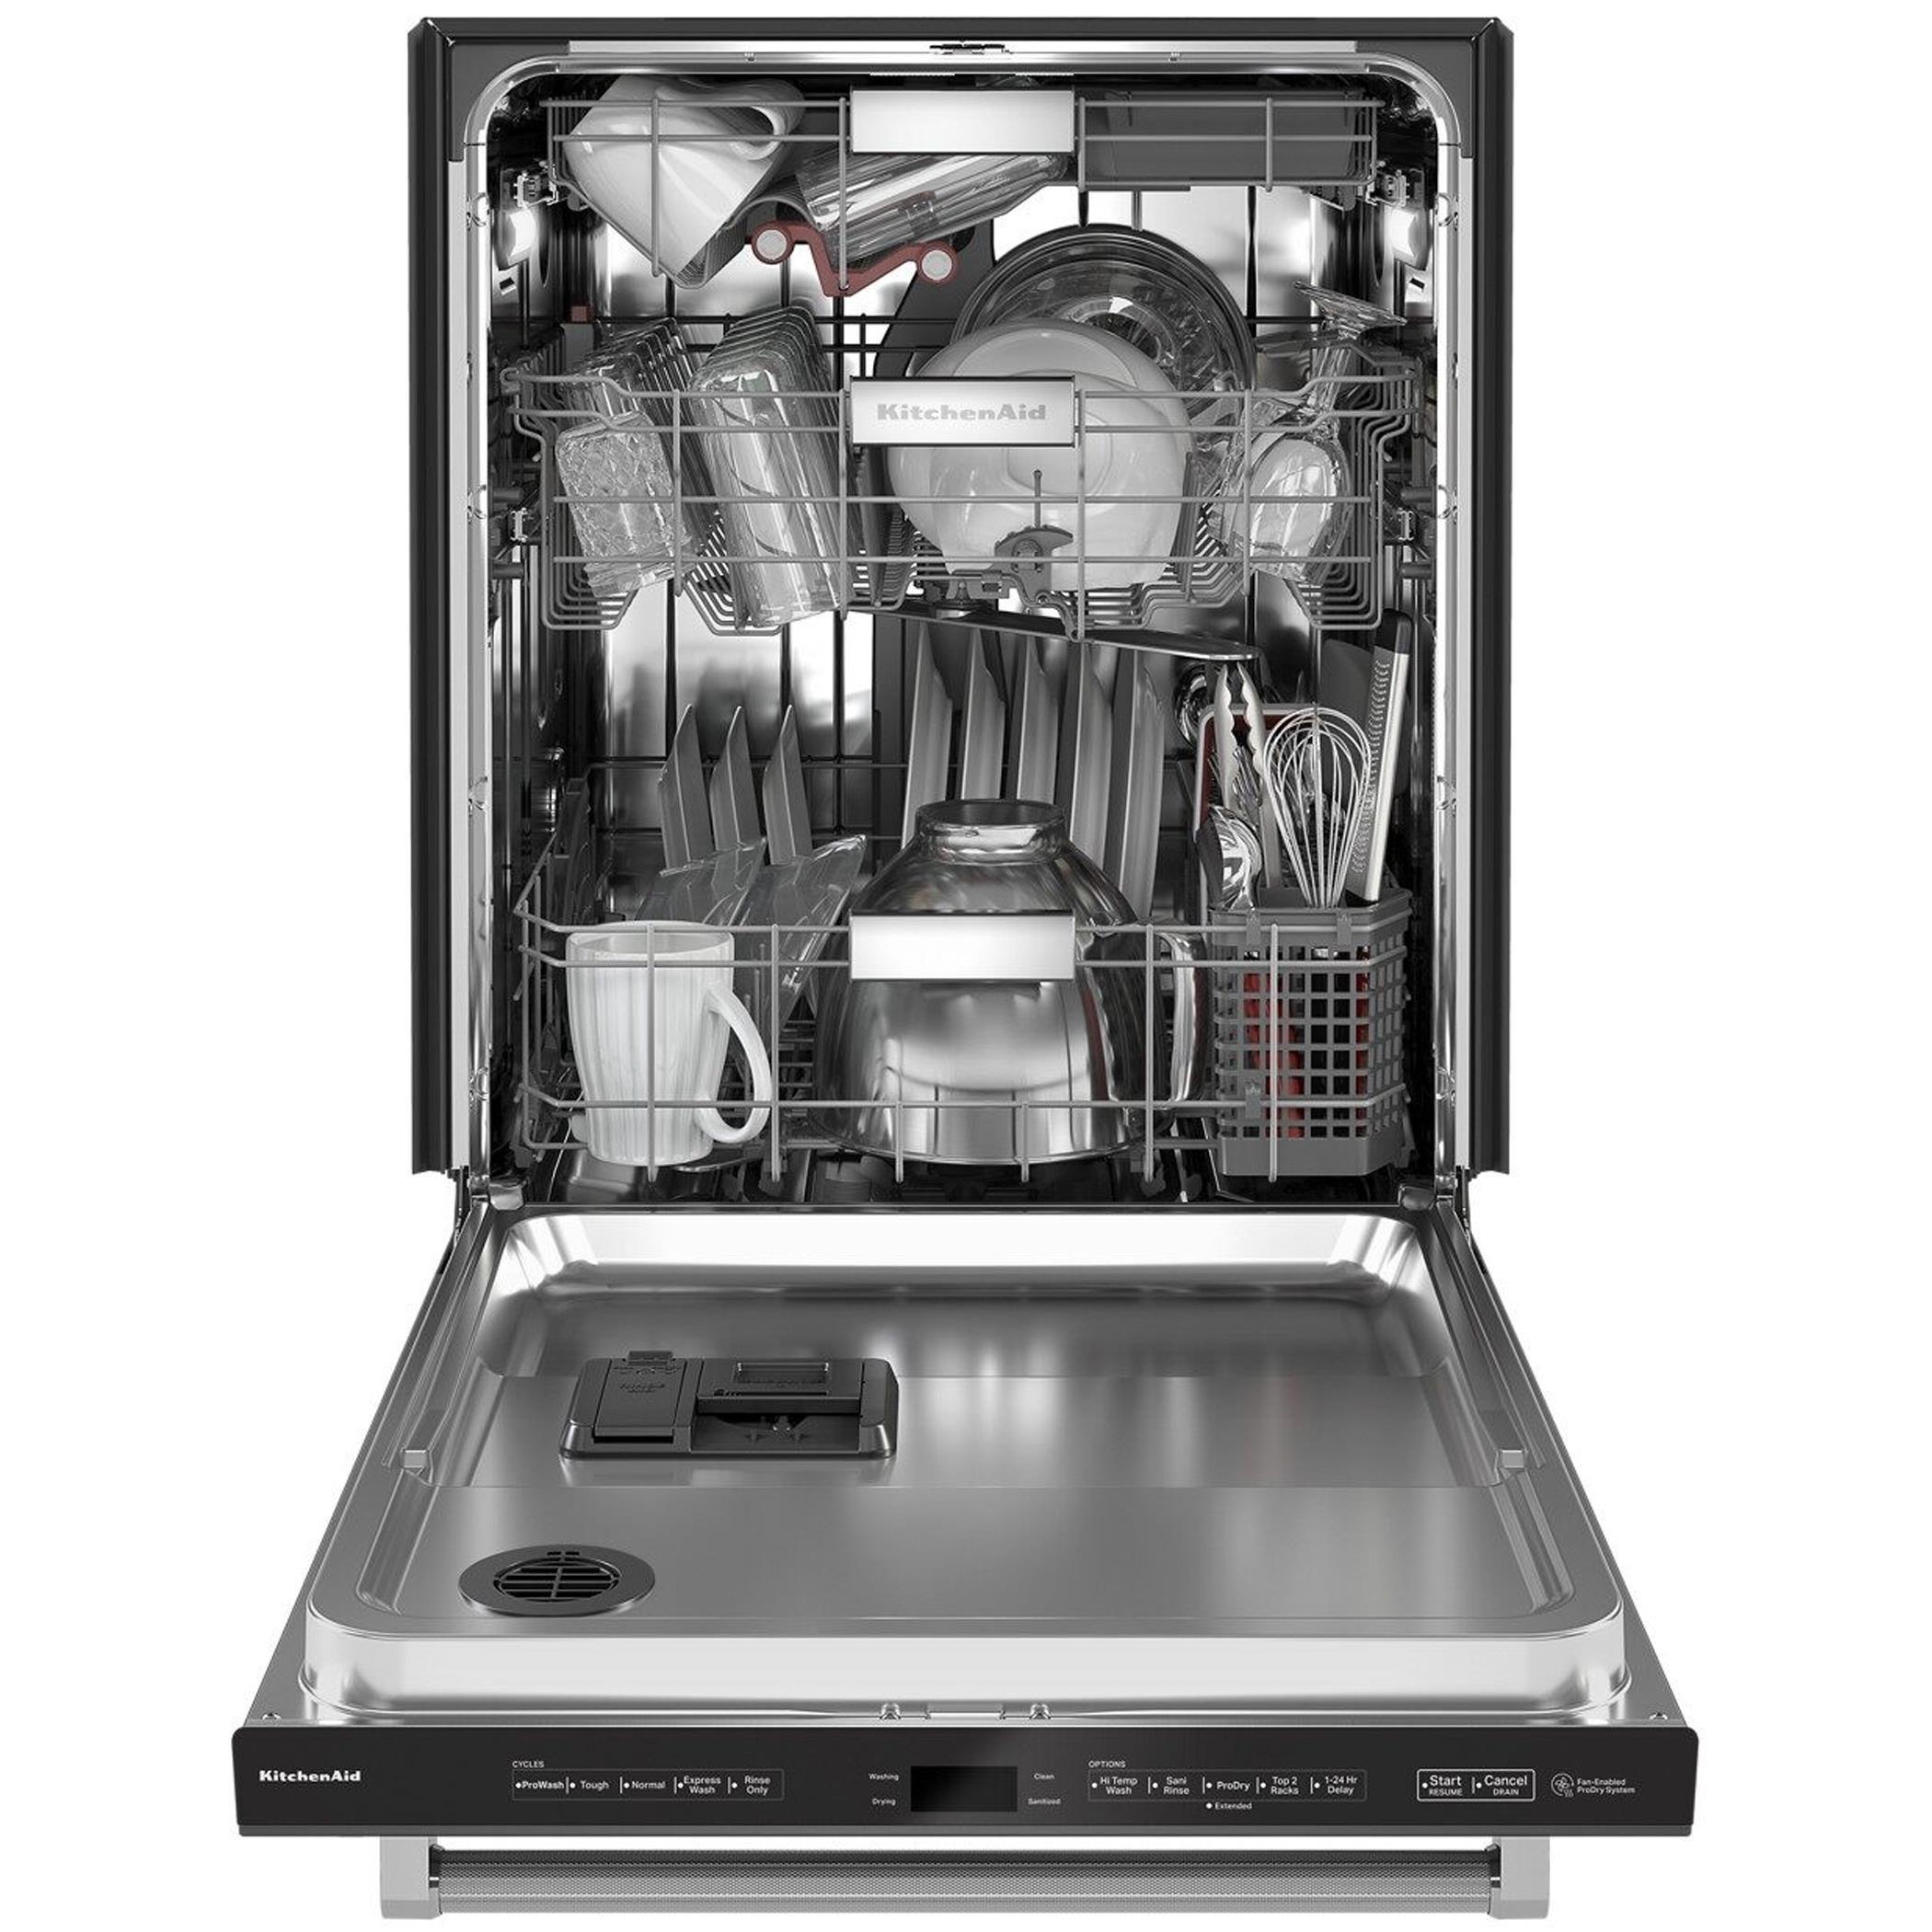 Kitchenaid 24 builtin bar handle dishwasher with